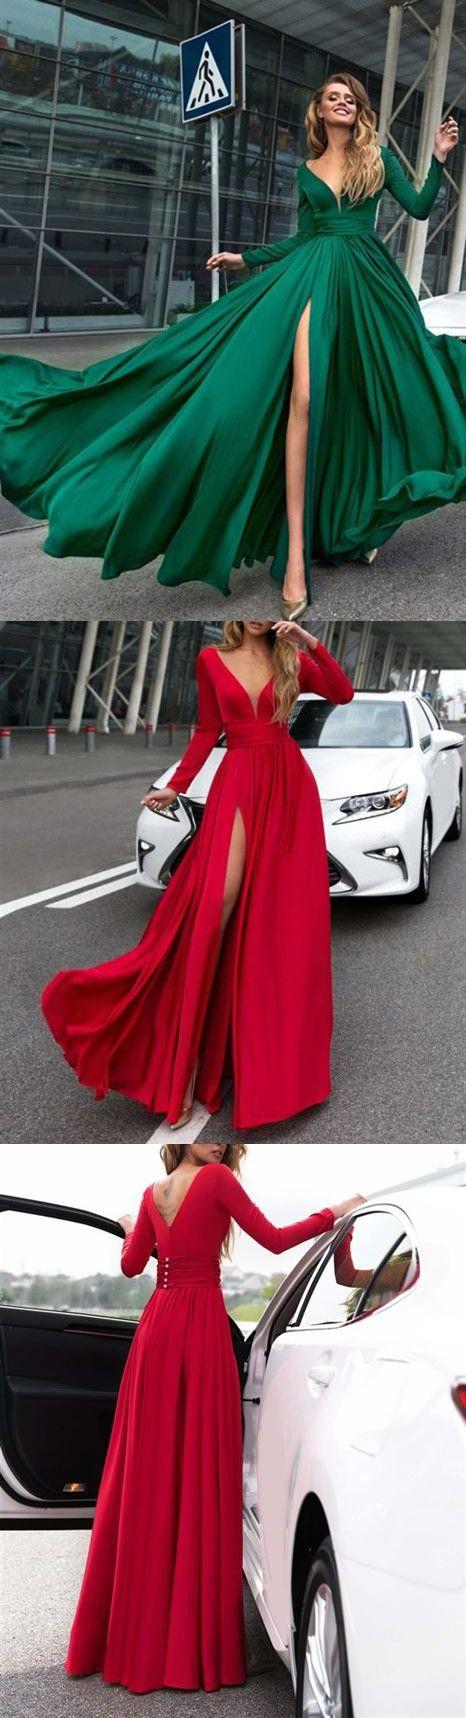 Aline vneck floorlength long sleeve chiffon prom dressevening